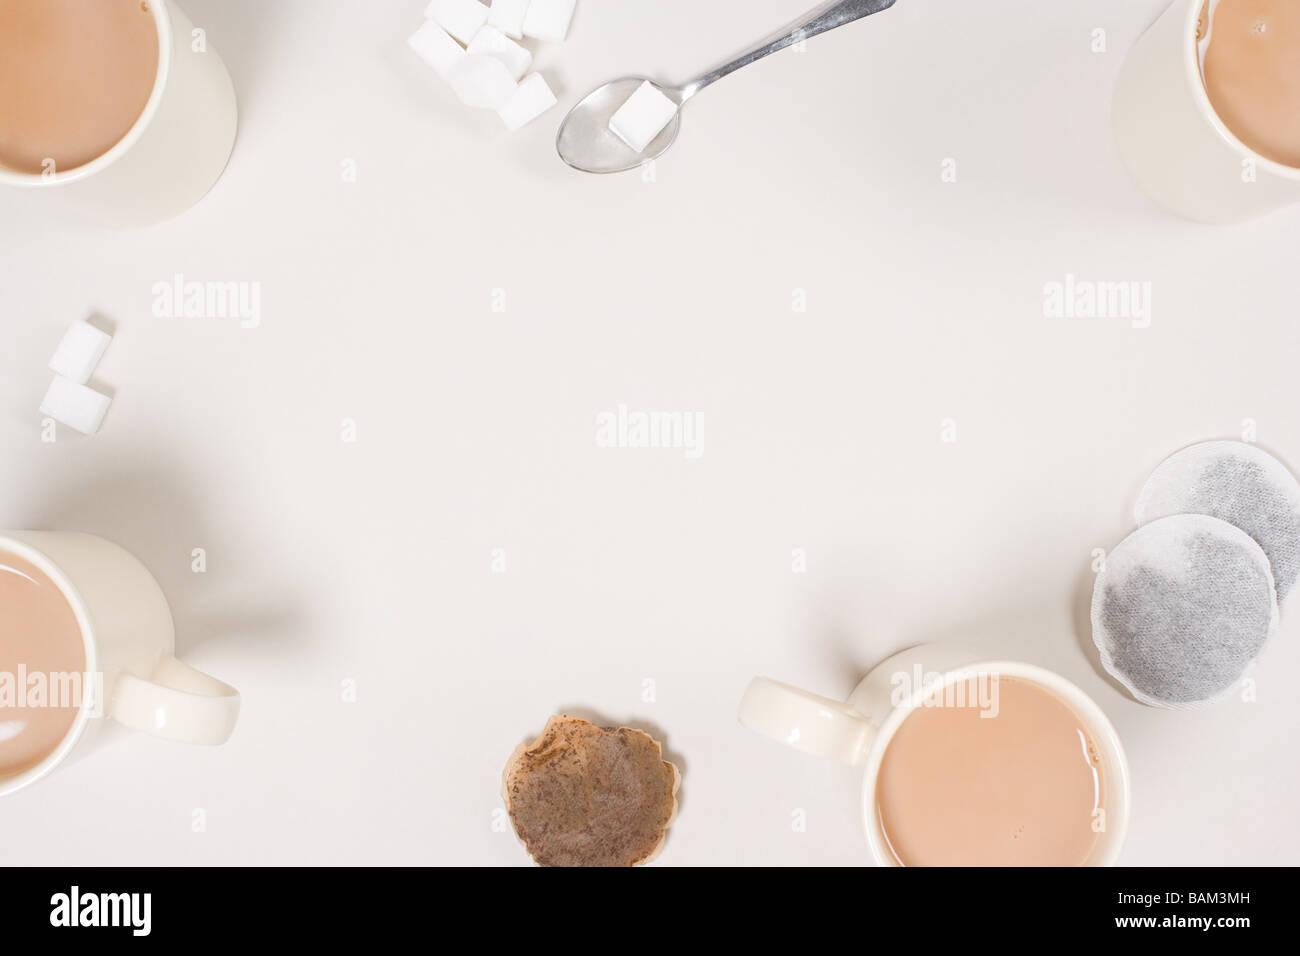 Tea and sugar lumps - Stock Image